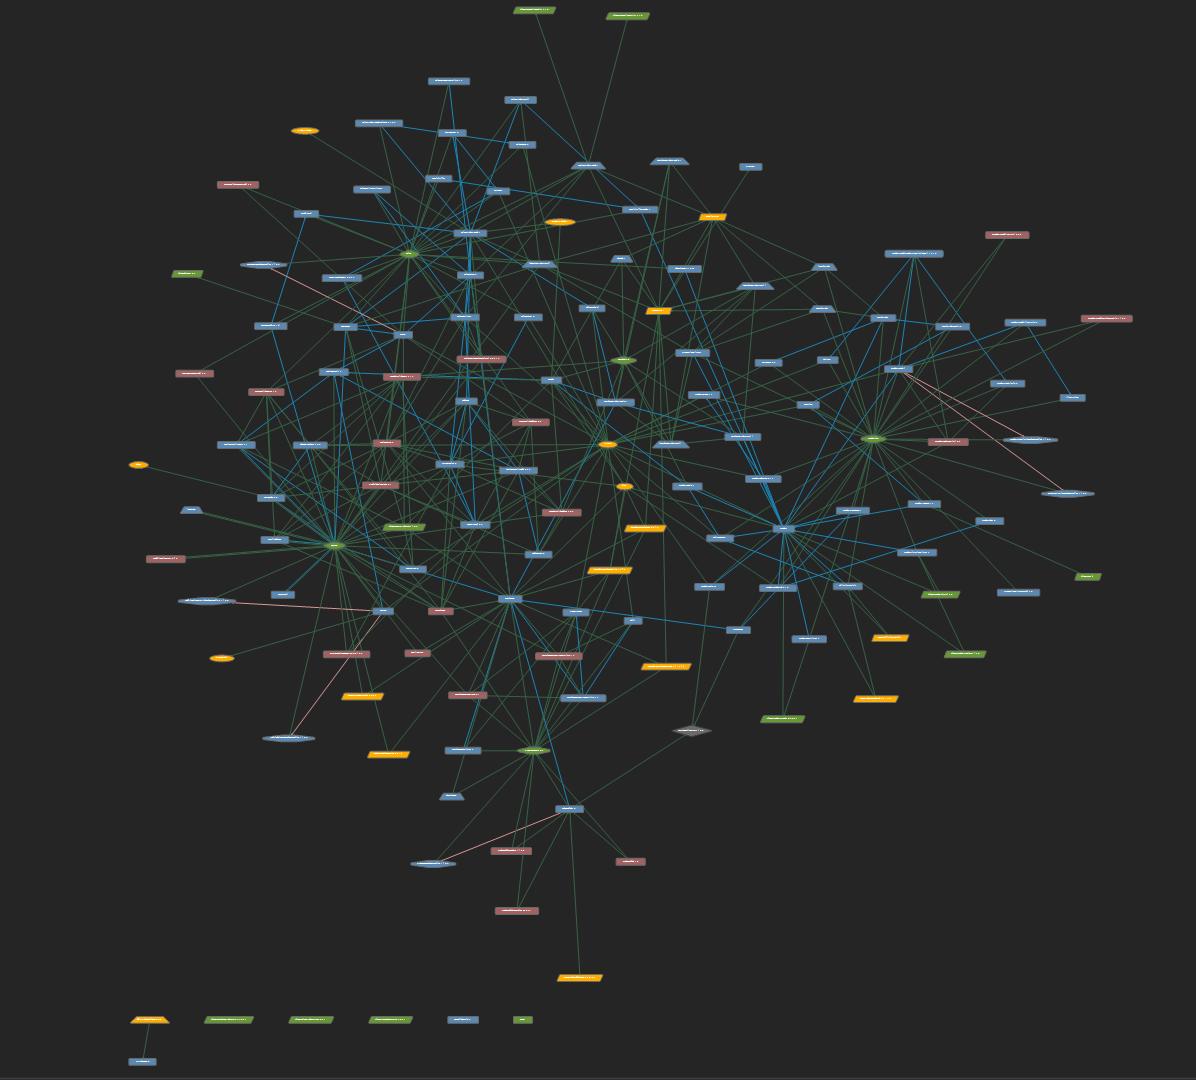 adventureworks 2012 diagram cj7 wiring microsoft sql server historical sample database tour